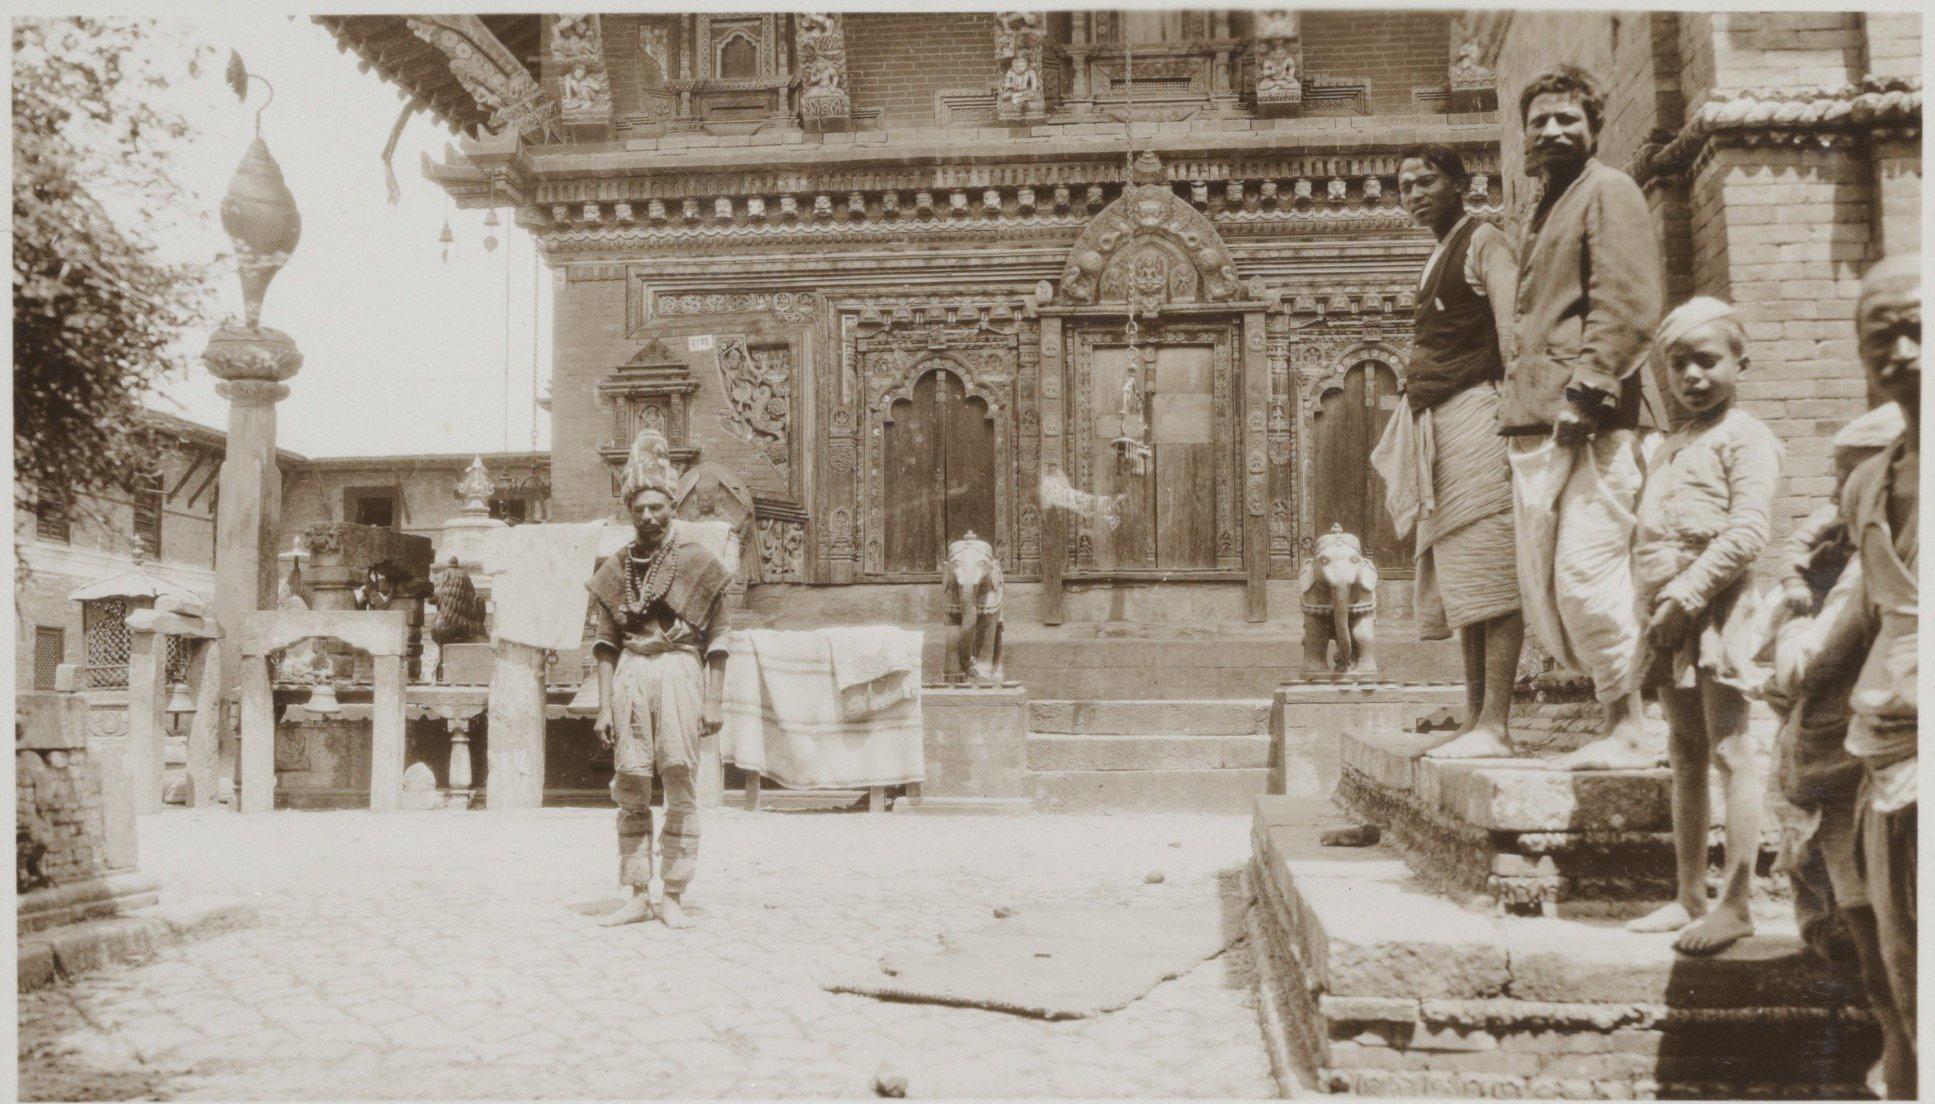 Changu Narayan Temple 1932-34 image